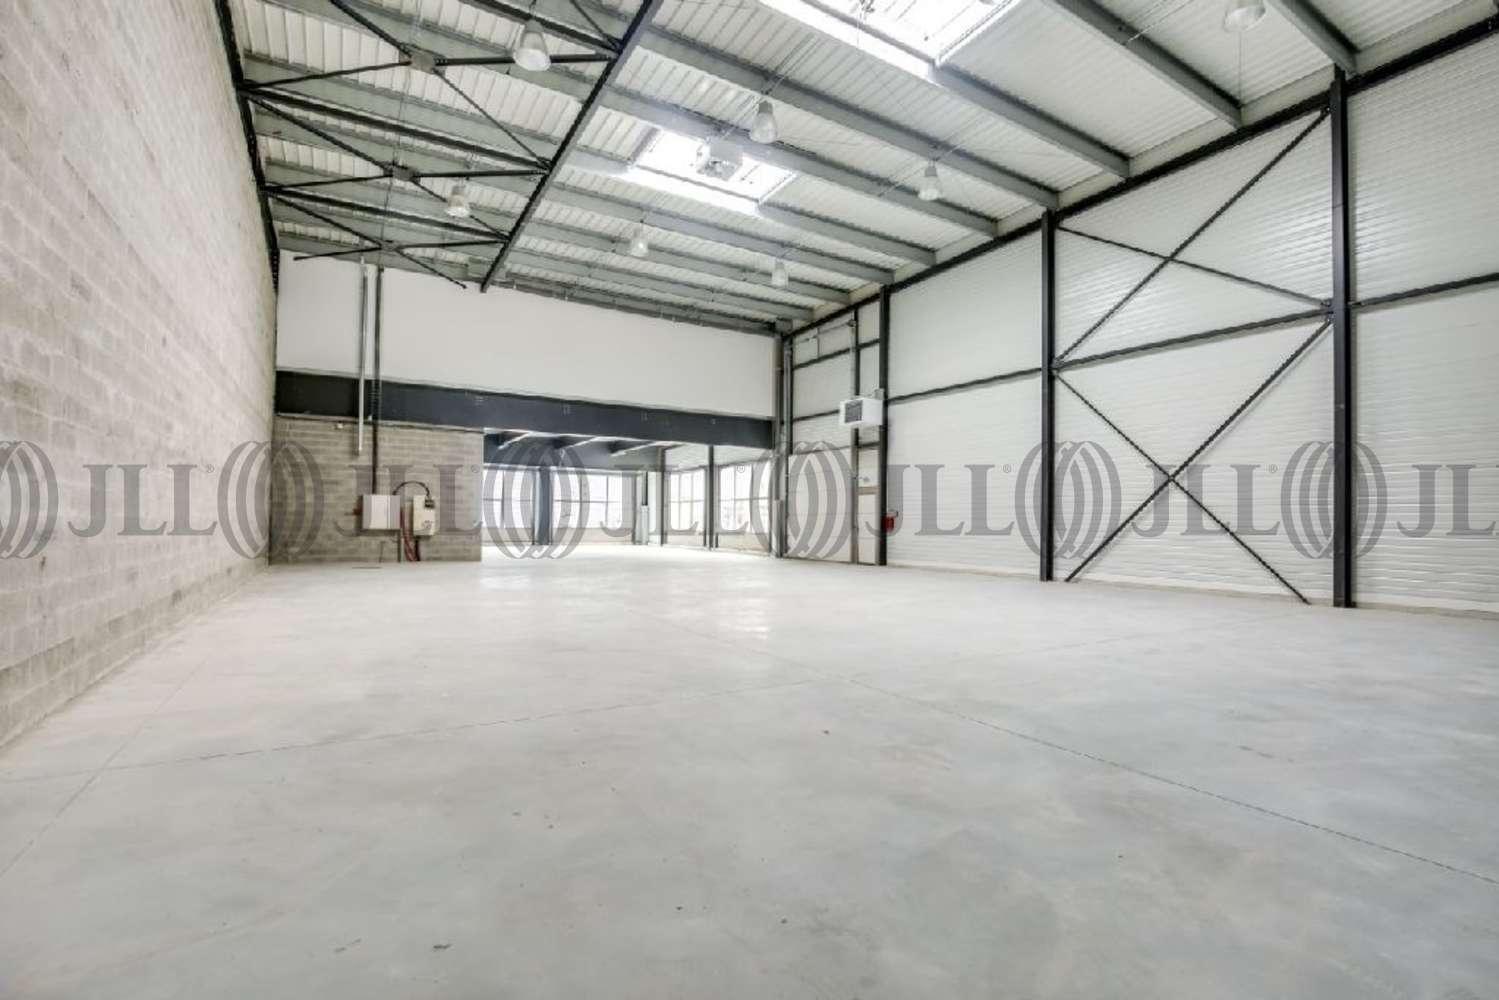 Activités/entrepôt Villebon sur yvette, 91140 - OGMA - 9621389